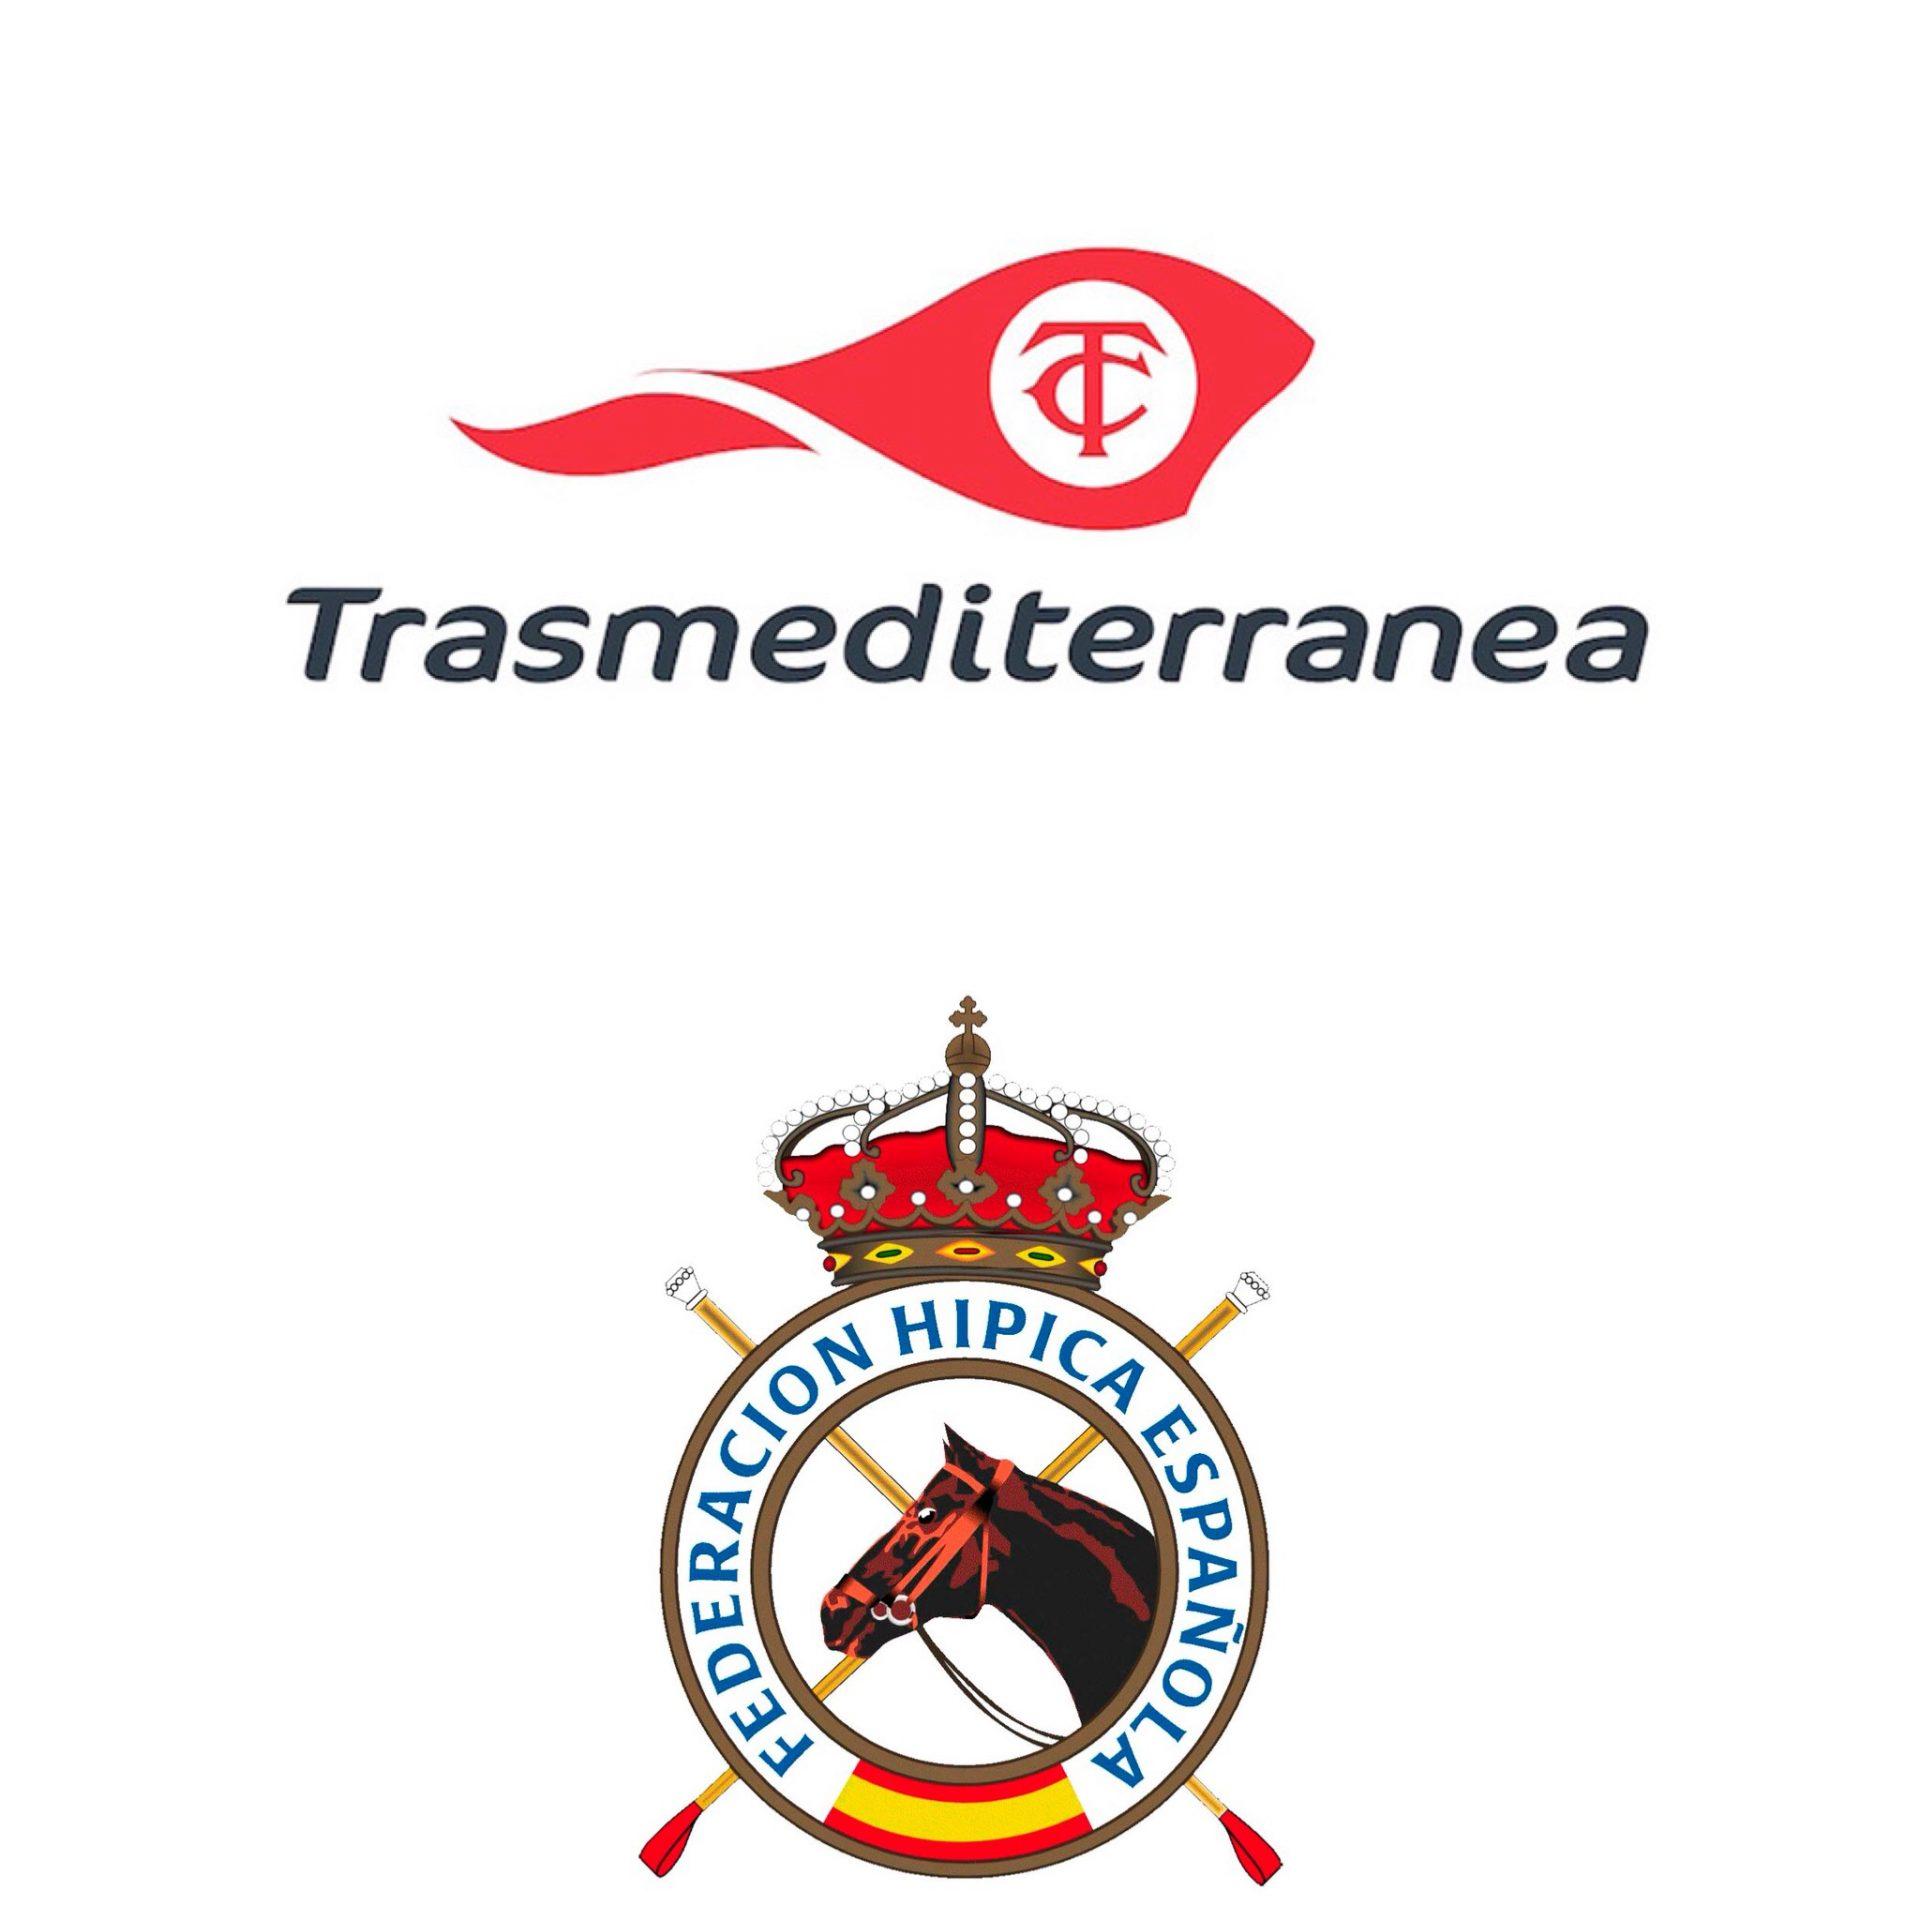 Trasmediterranea RFHE